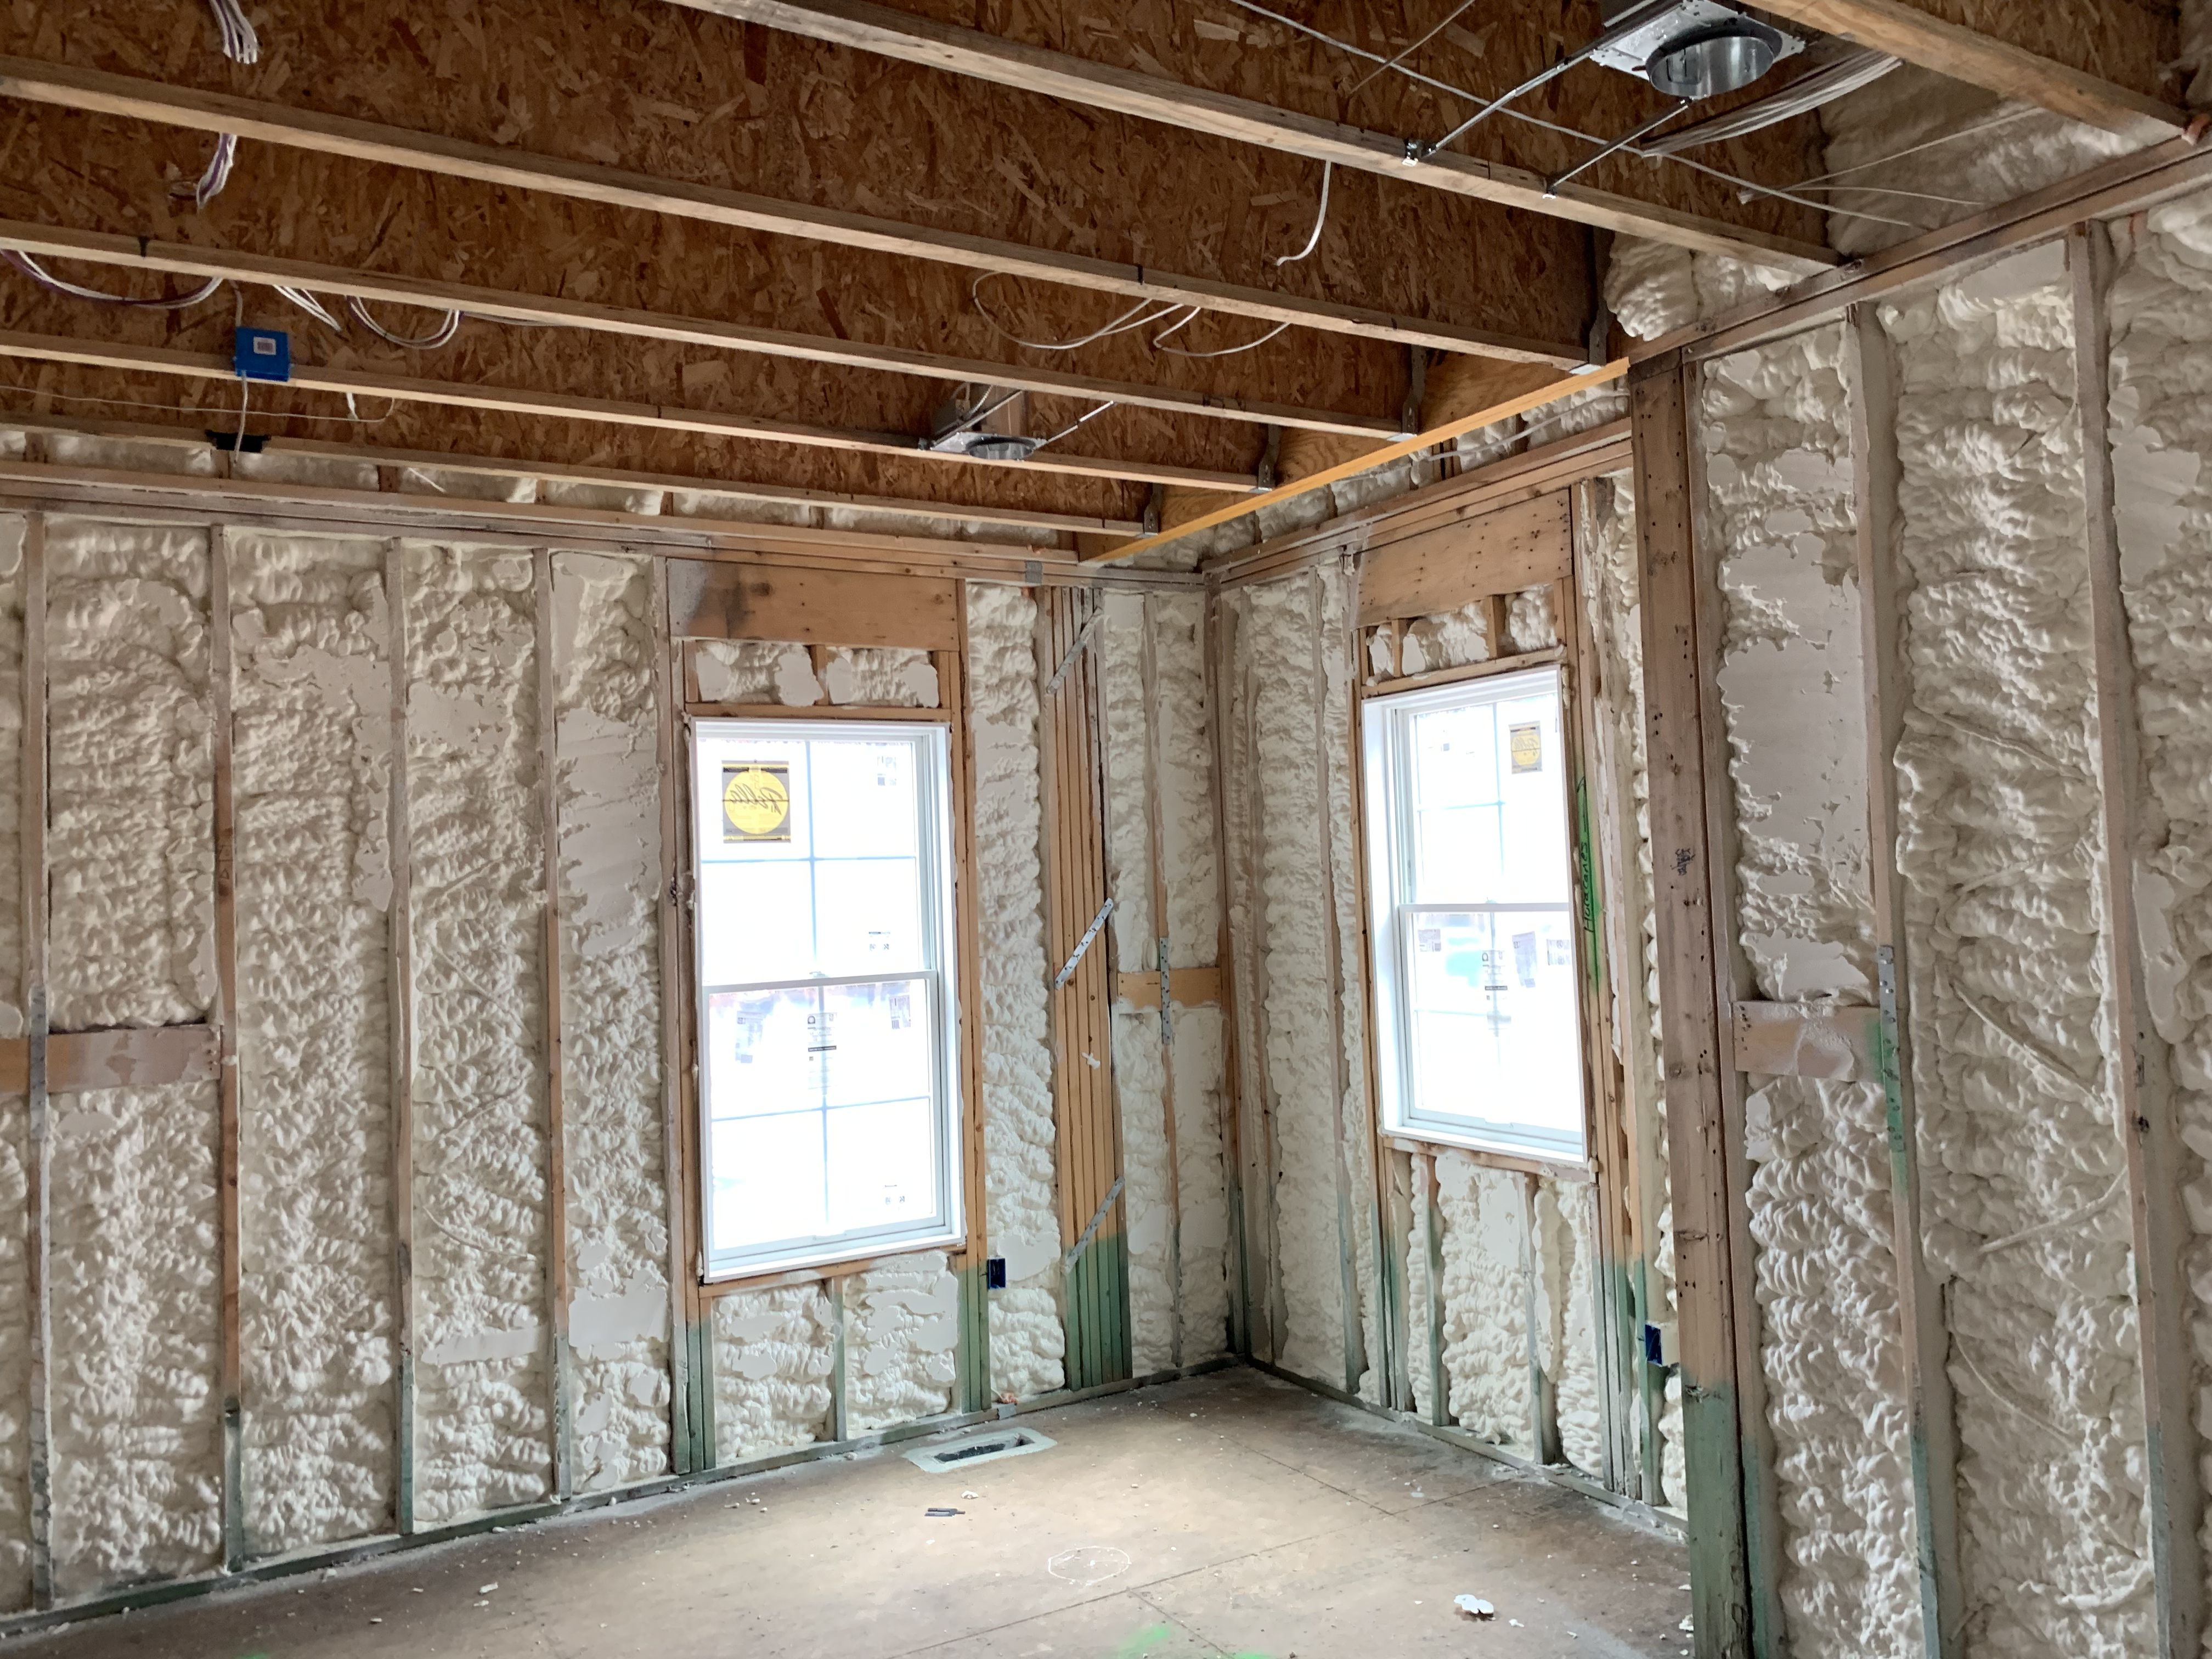 Spray Foam Insulation On An Exterior 2x6 Wall Brick House Designs Exterior Brick Exterior House Colors